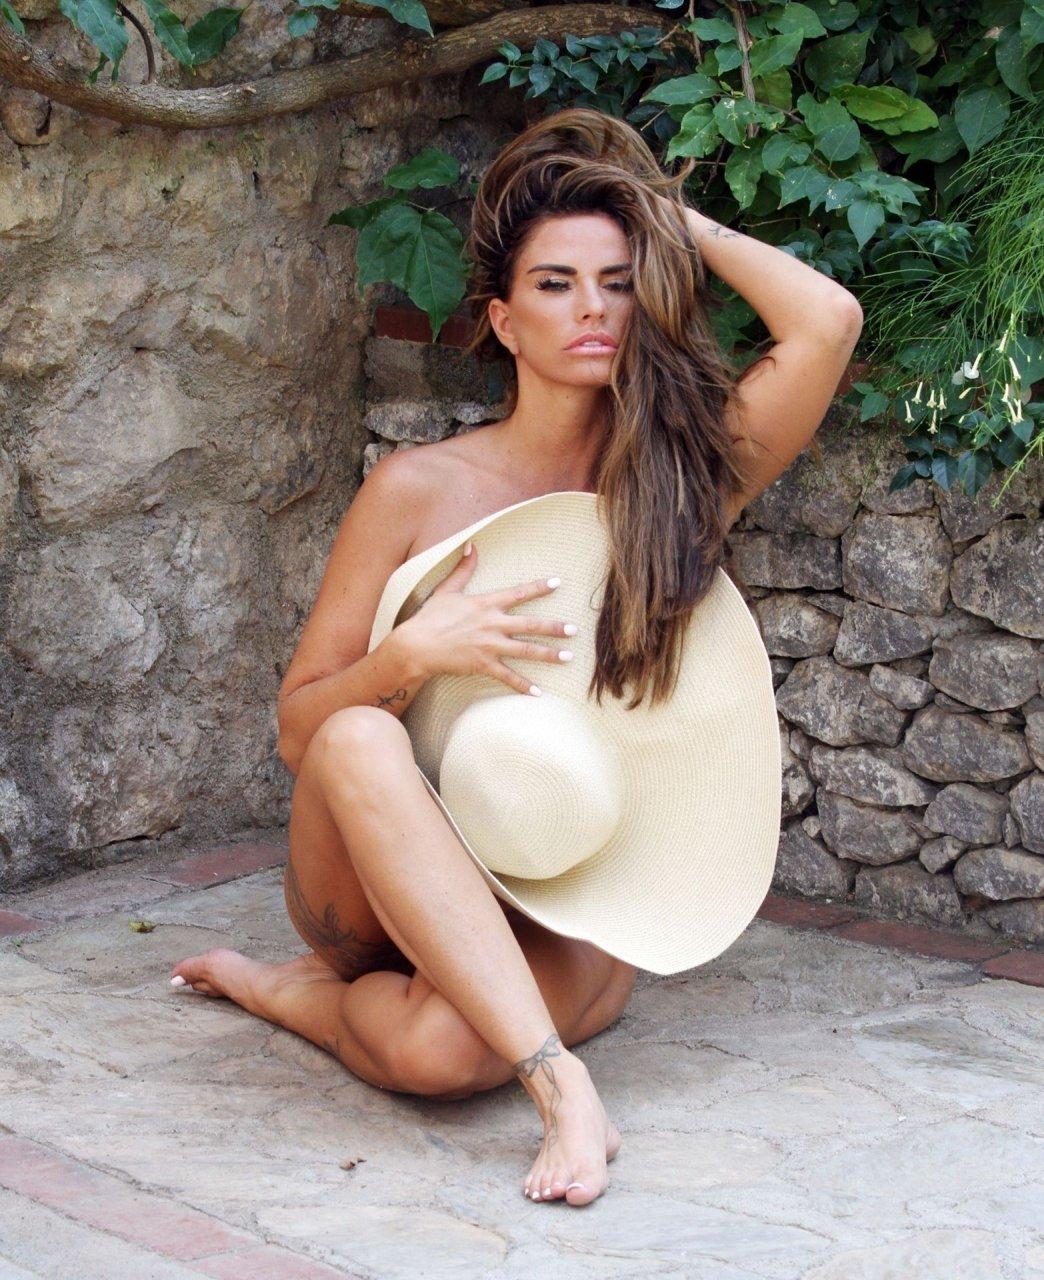 Katie-Price-Nude-Sexy-TheFappeningBlog.com-109.jpg